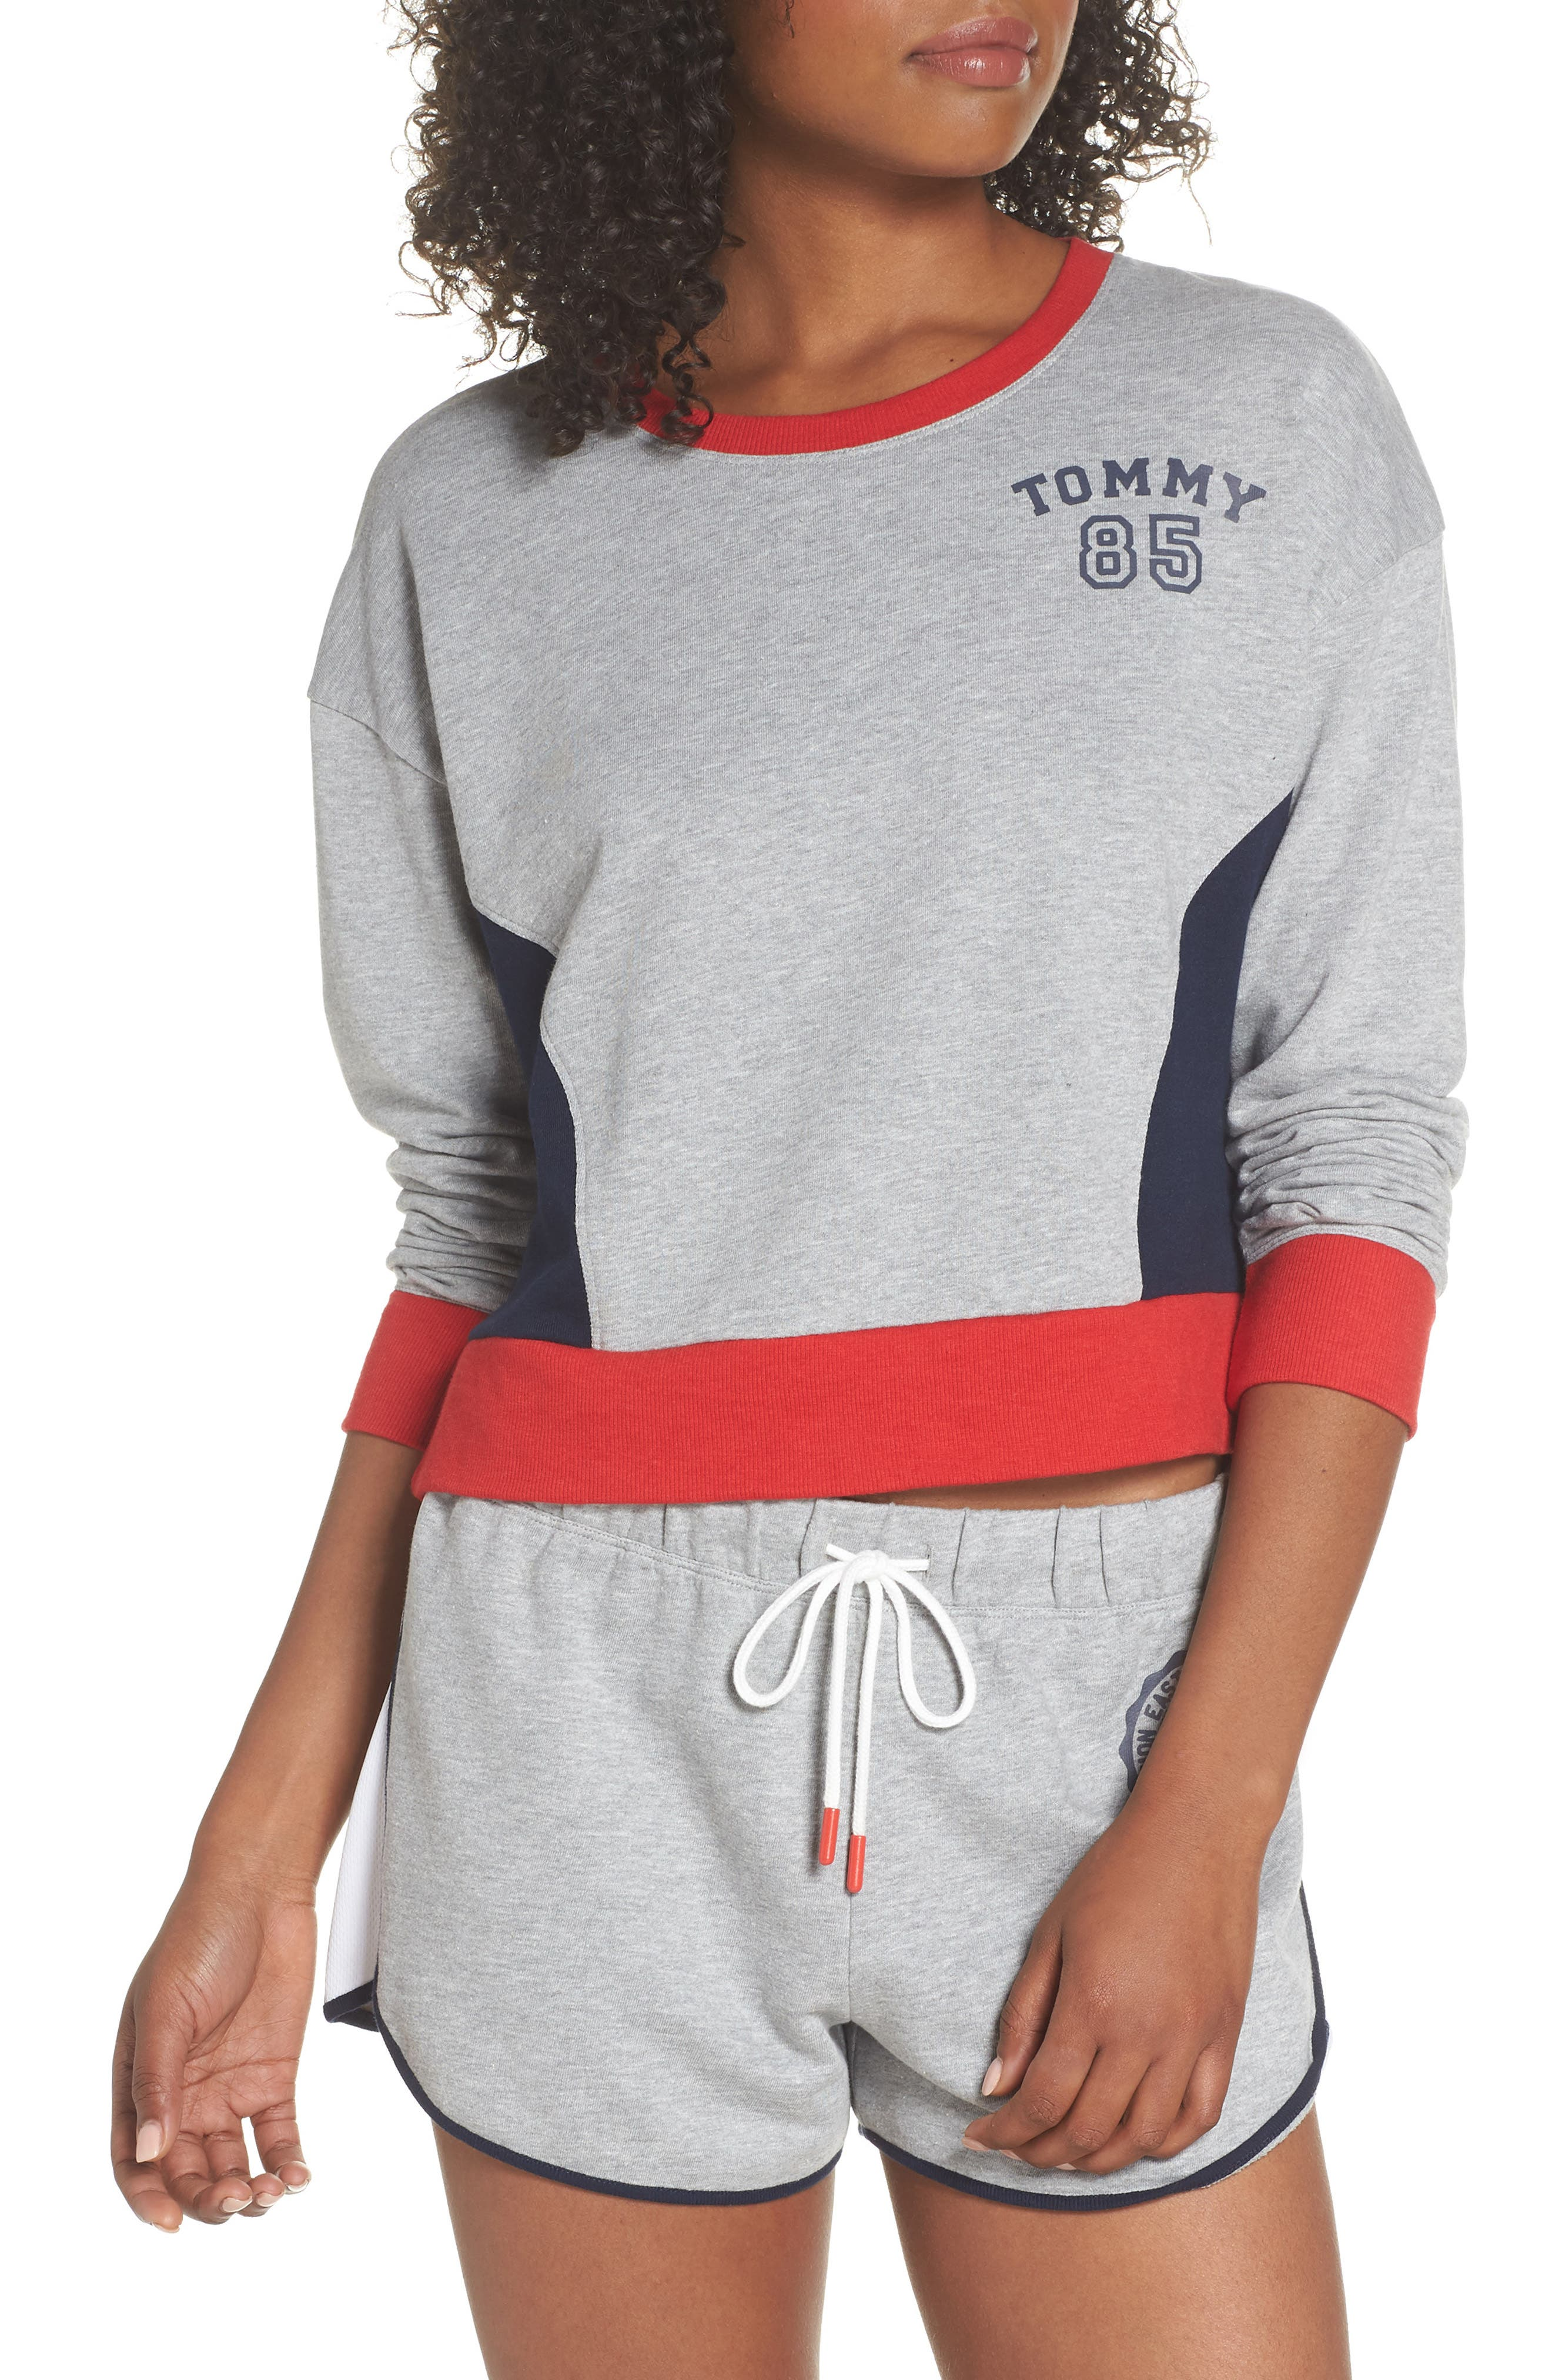 TOMMY HILFIGER,                             Crop Lounge Sweatshirt,                             Main thumbnail 1, color,                             025